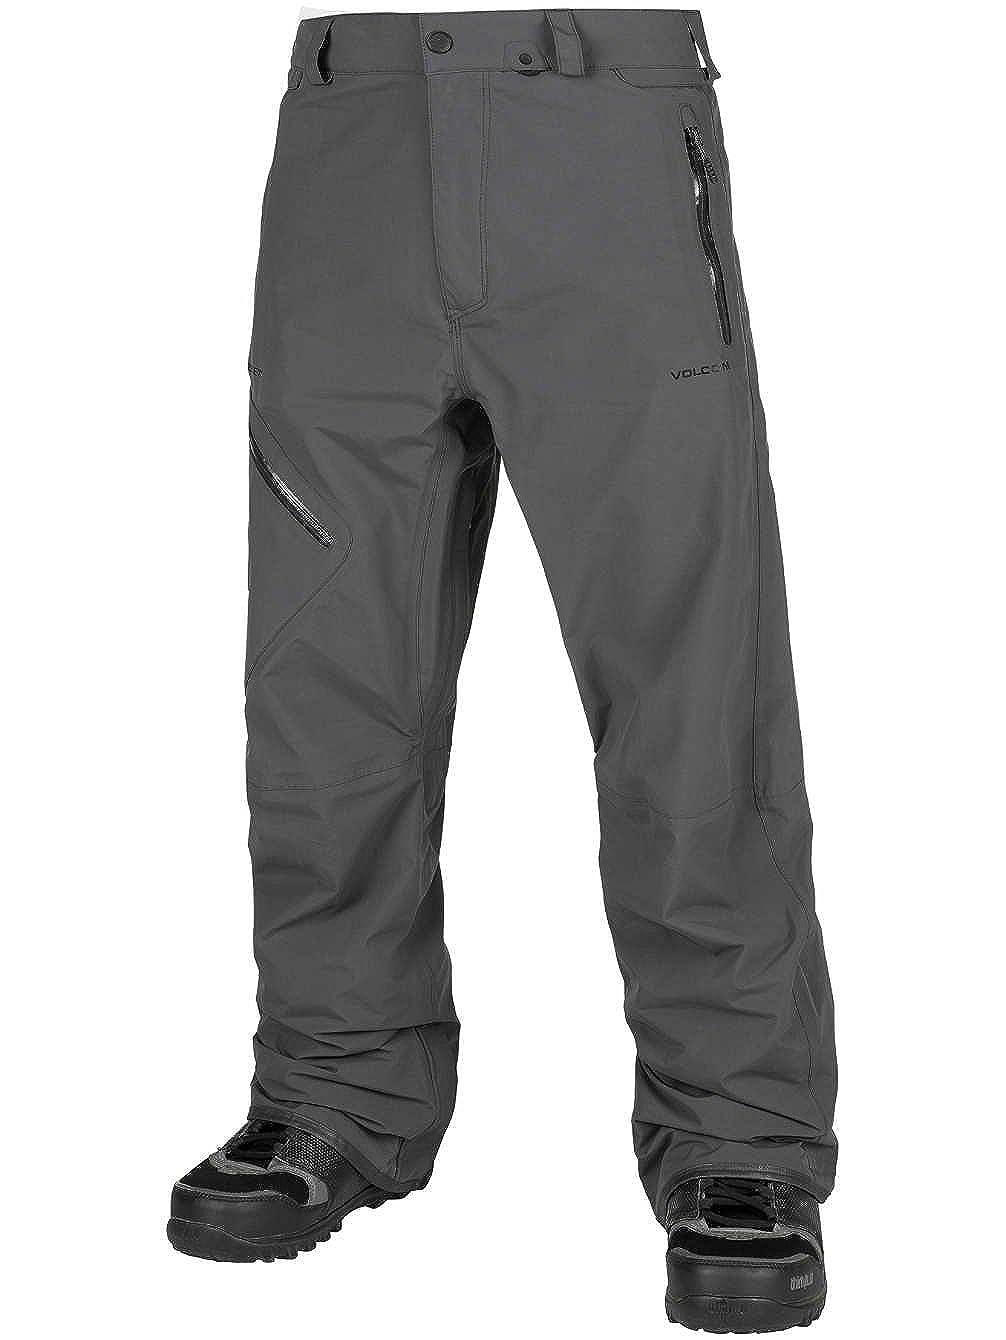 Volcom OUTERWEAR メンズ B0794YPL3K XX-Large|ブラック(Vintage Black) ブラック(Vintage Black) XX-Large